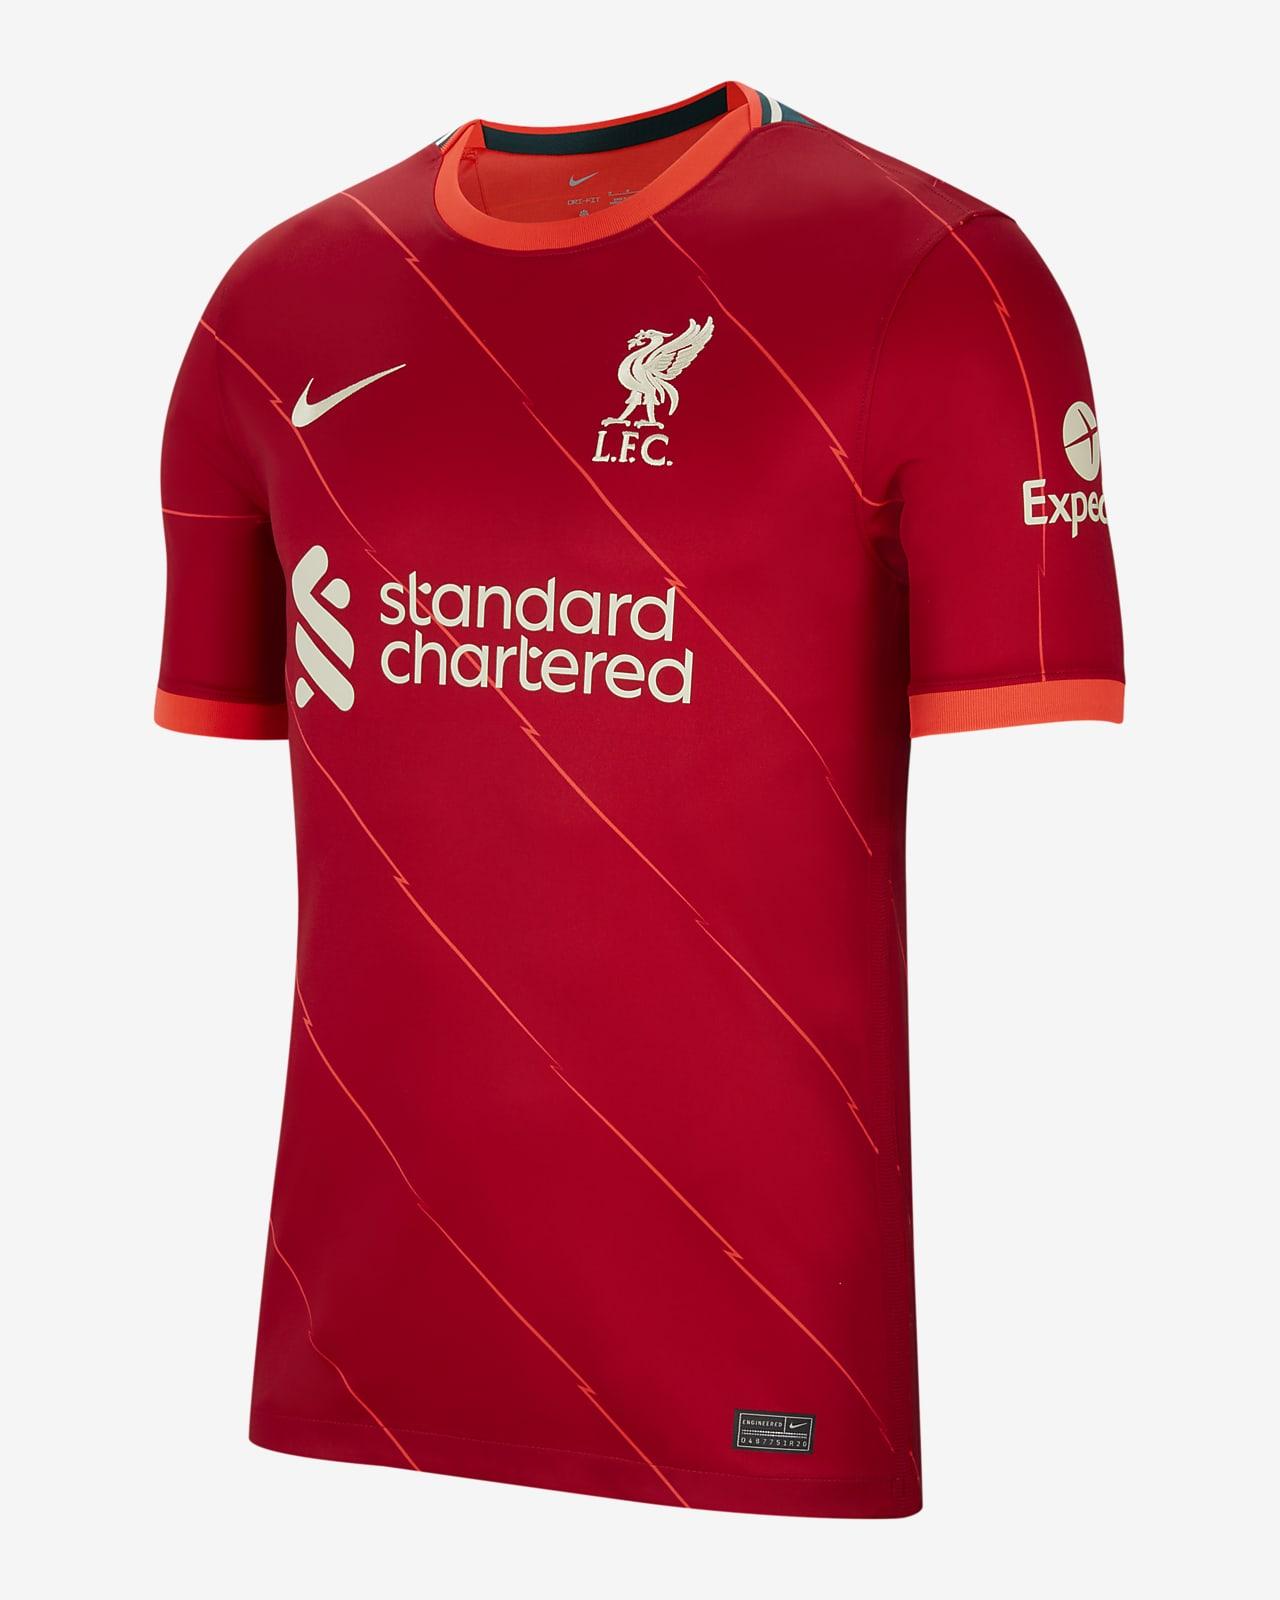 Maglia da calcio M Salah Liverpool FC 2021/22 Stadium da uomo - Home